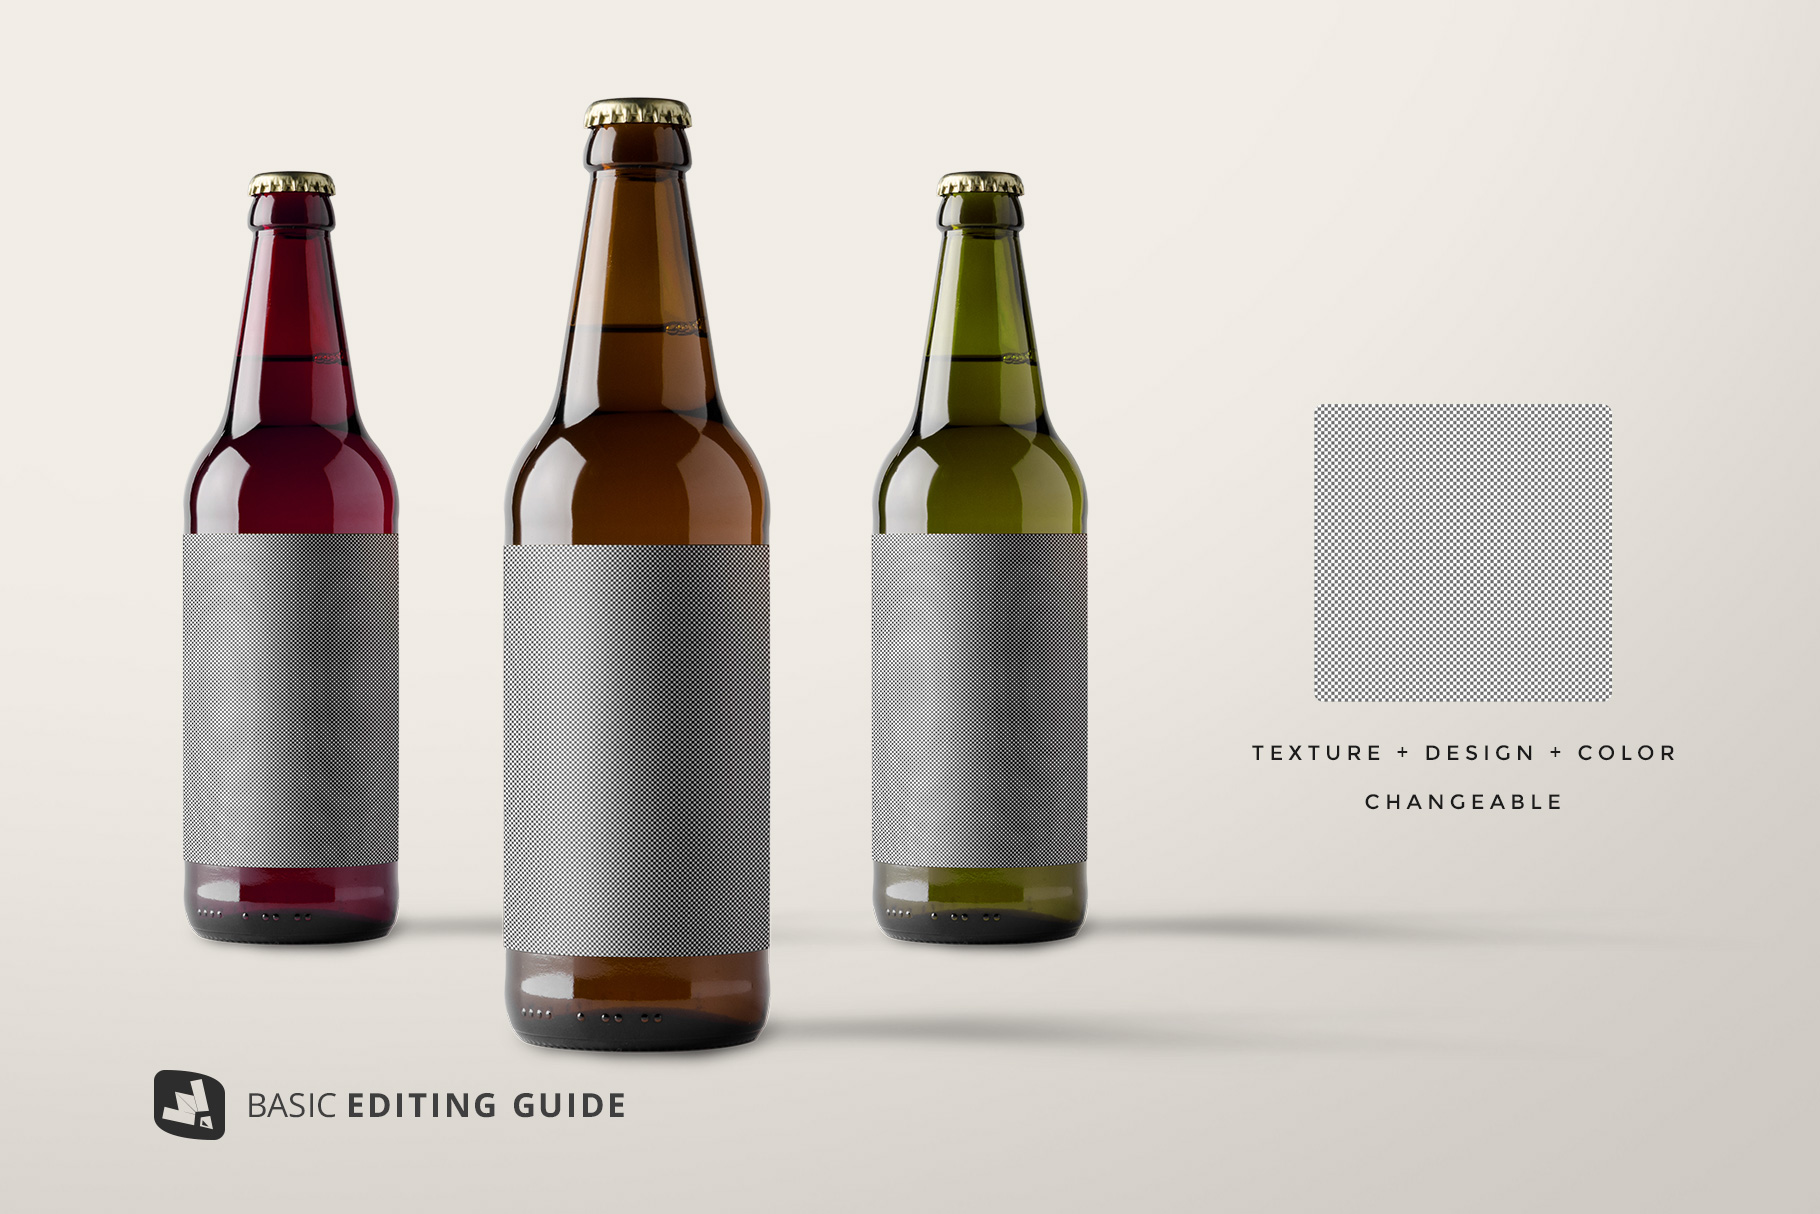 editability of the craft beer bottle packaging mockup